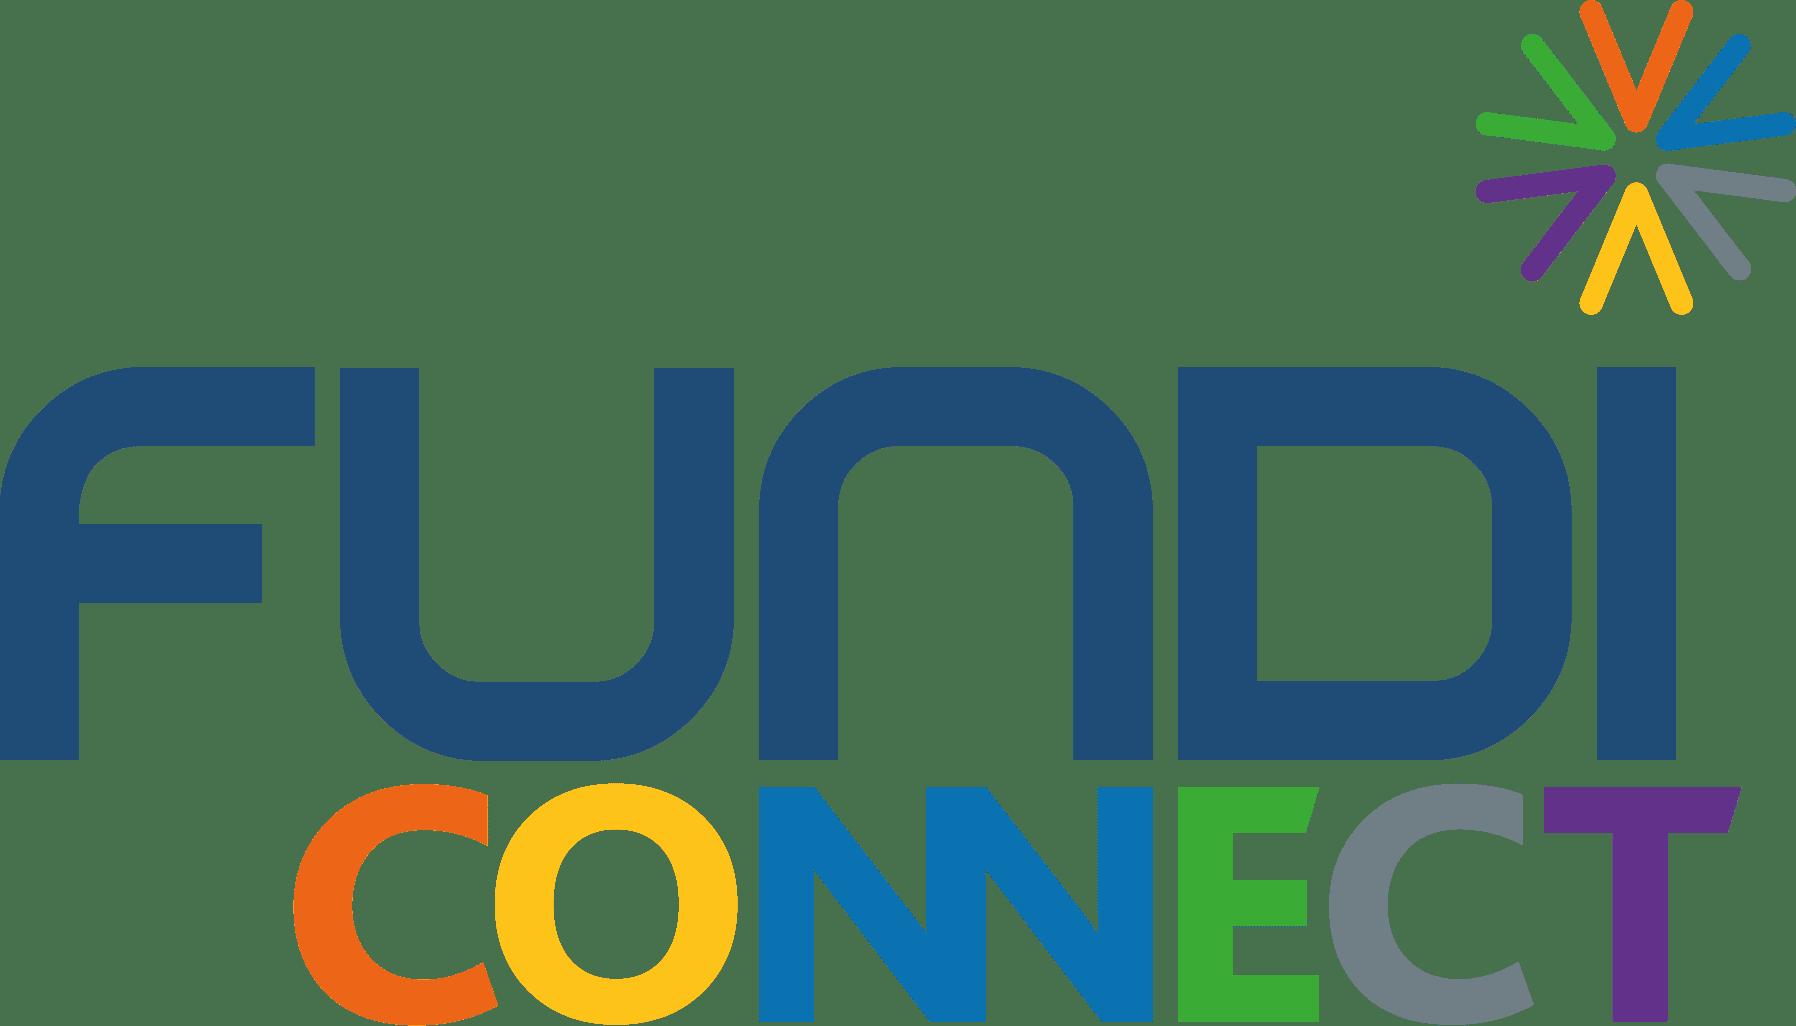 FundiConnect